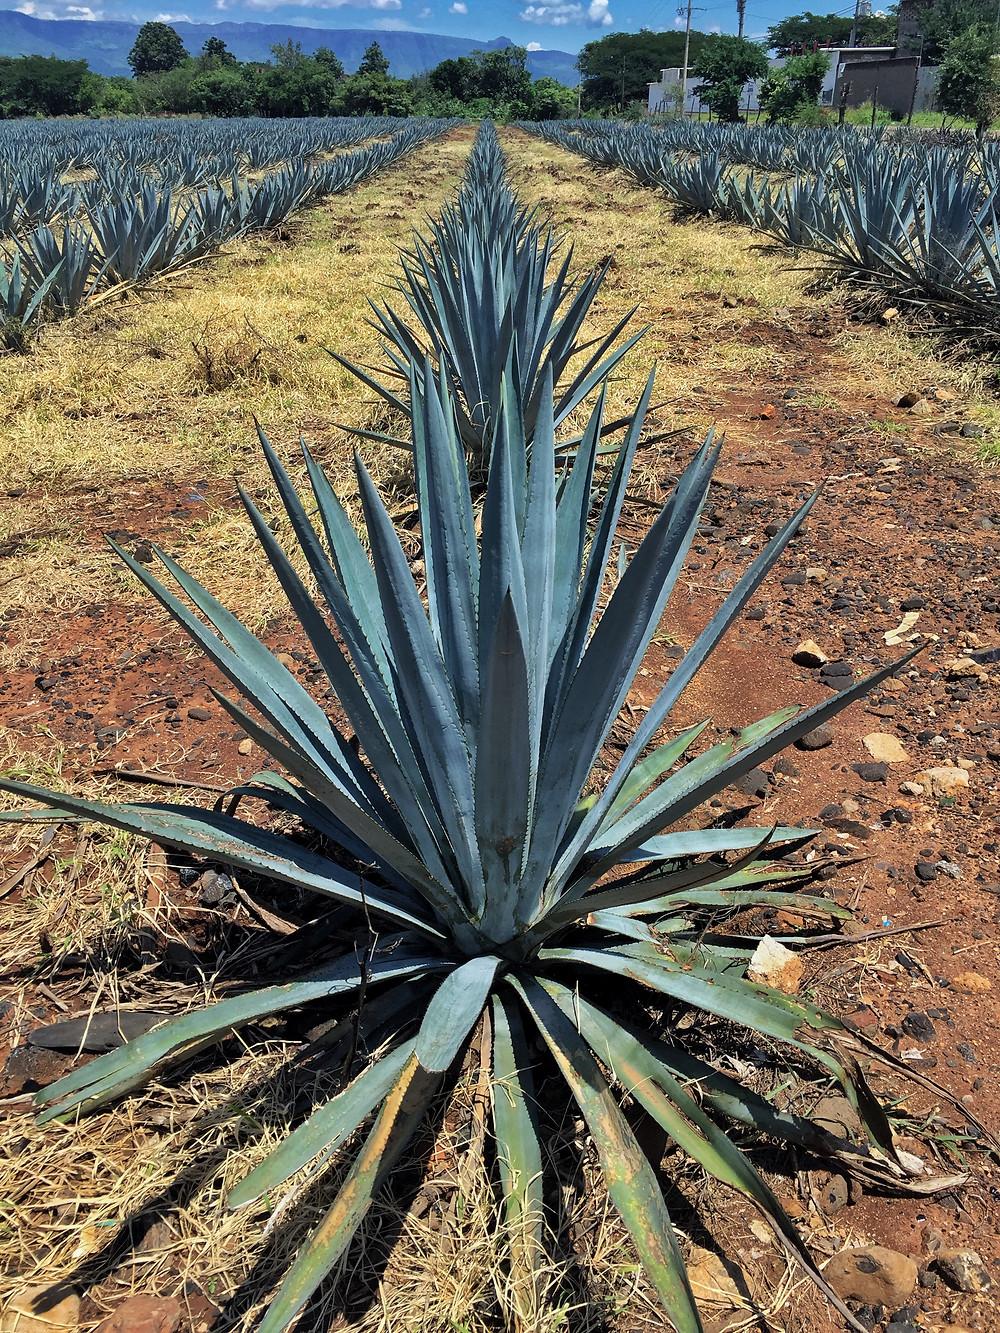 Tequila plant